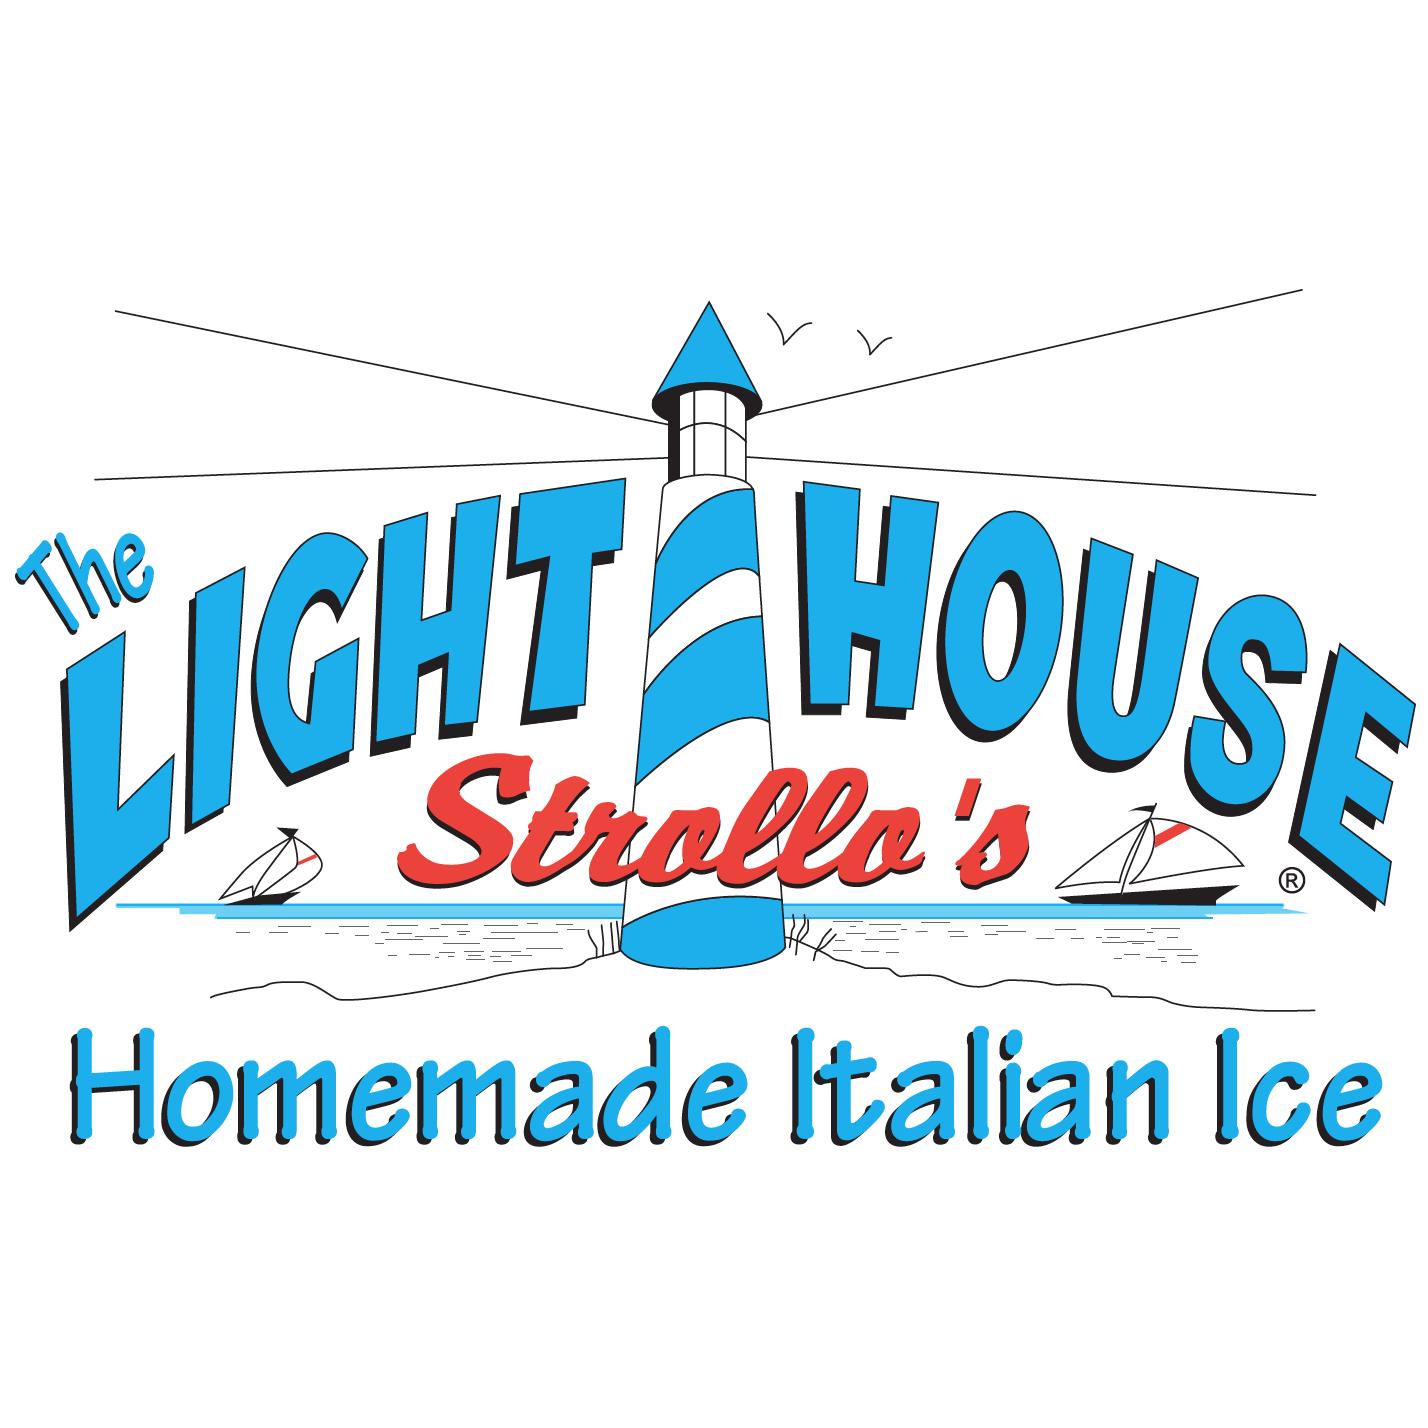 The Lighthouse Strollo's Homemade Italian Ice